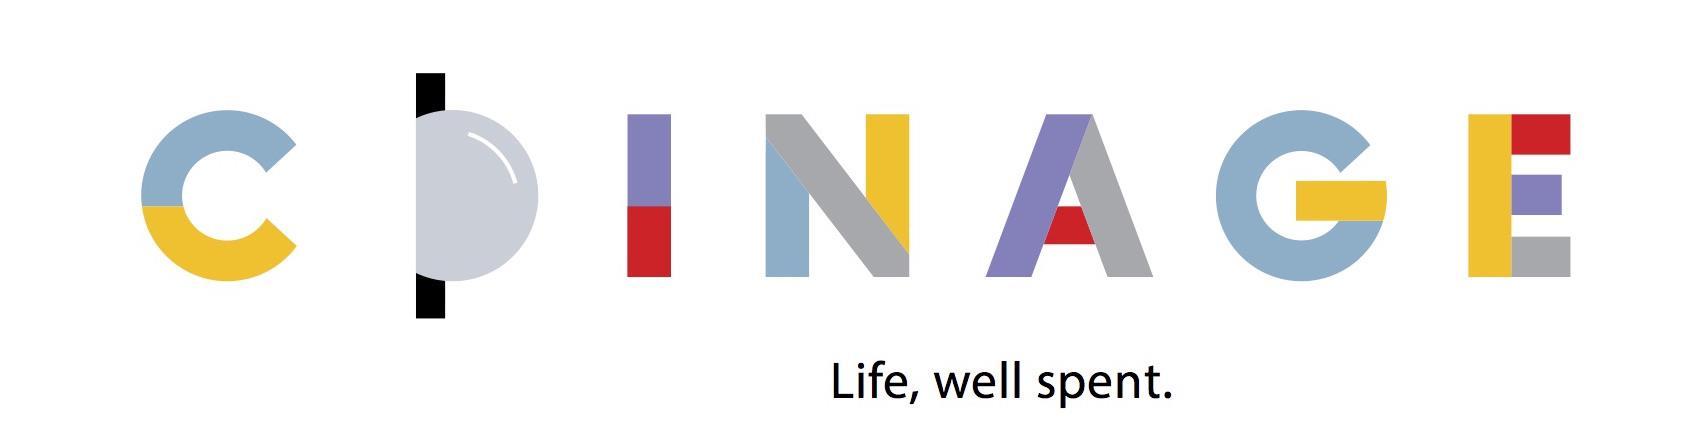 Time Inc Coinage logo (Time Inc.)